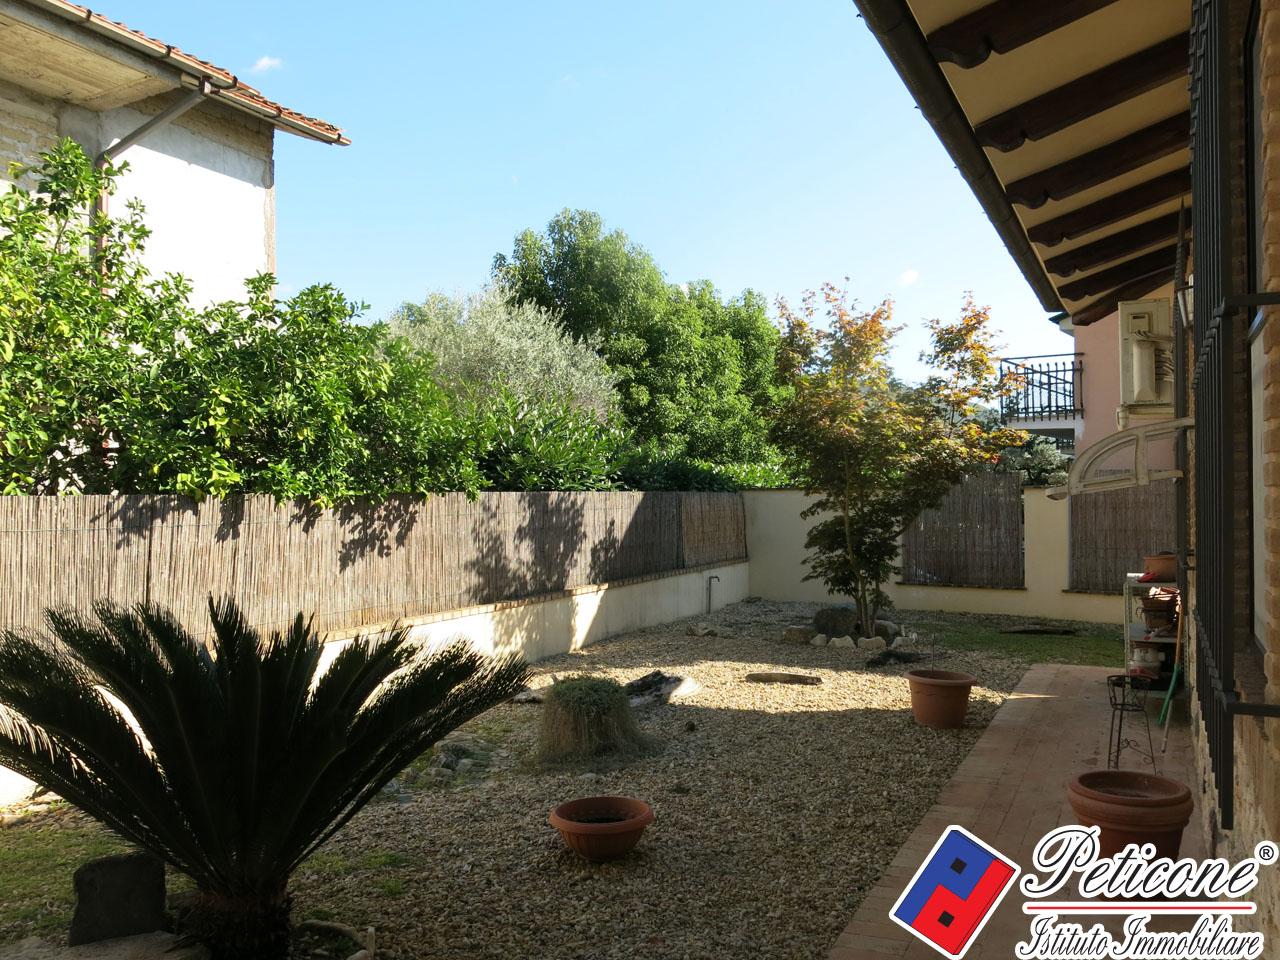 Villa in Vendita a Fondi: 3 locali, 107 mq - Foto 29